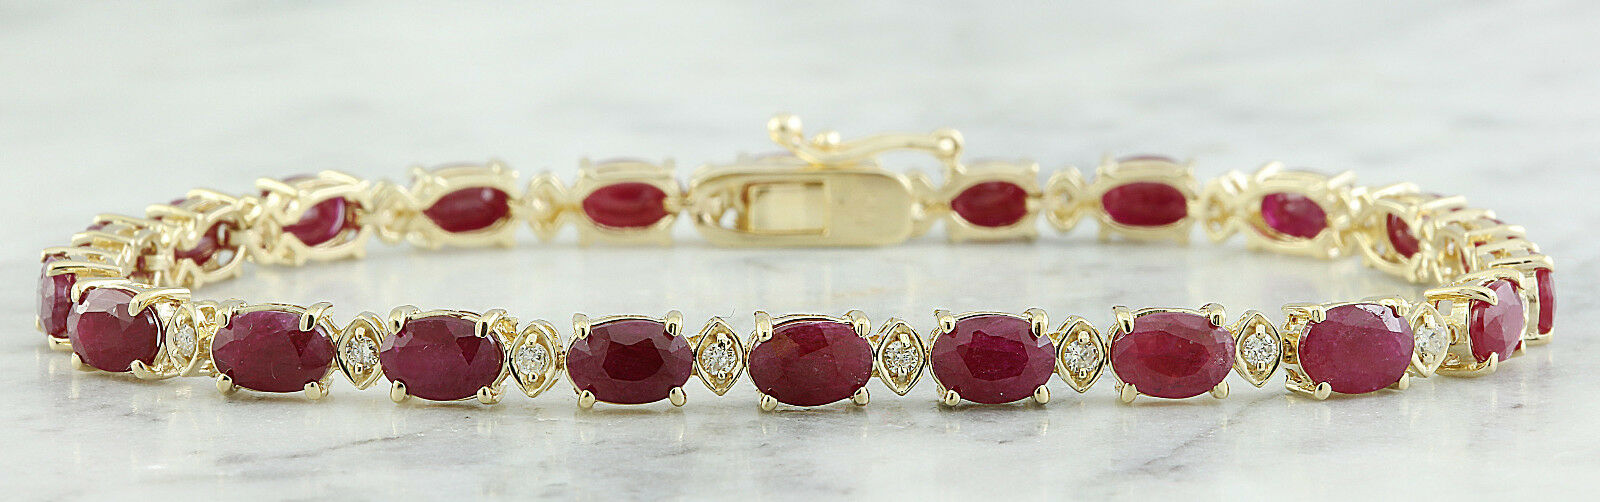 11.95 Carat Genuine Ruby 14K Solid Yellow gold Diamond Bracelet